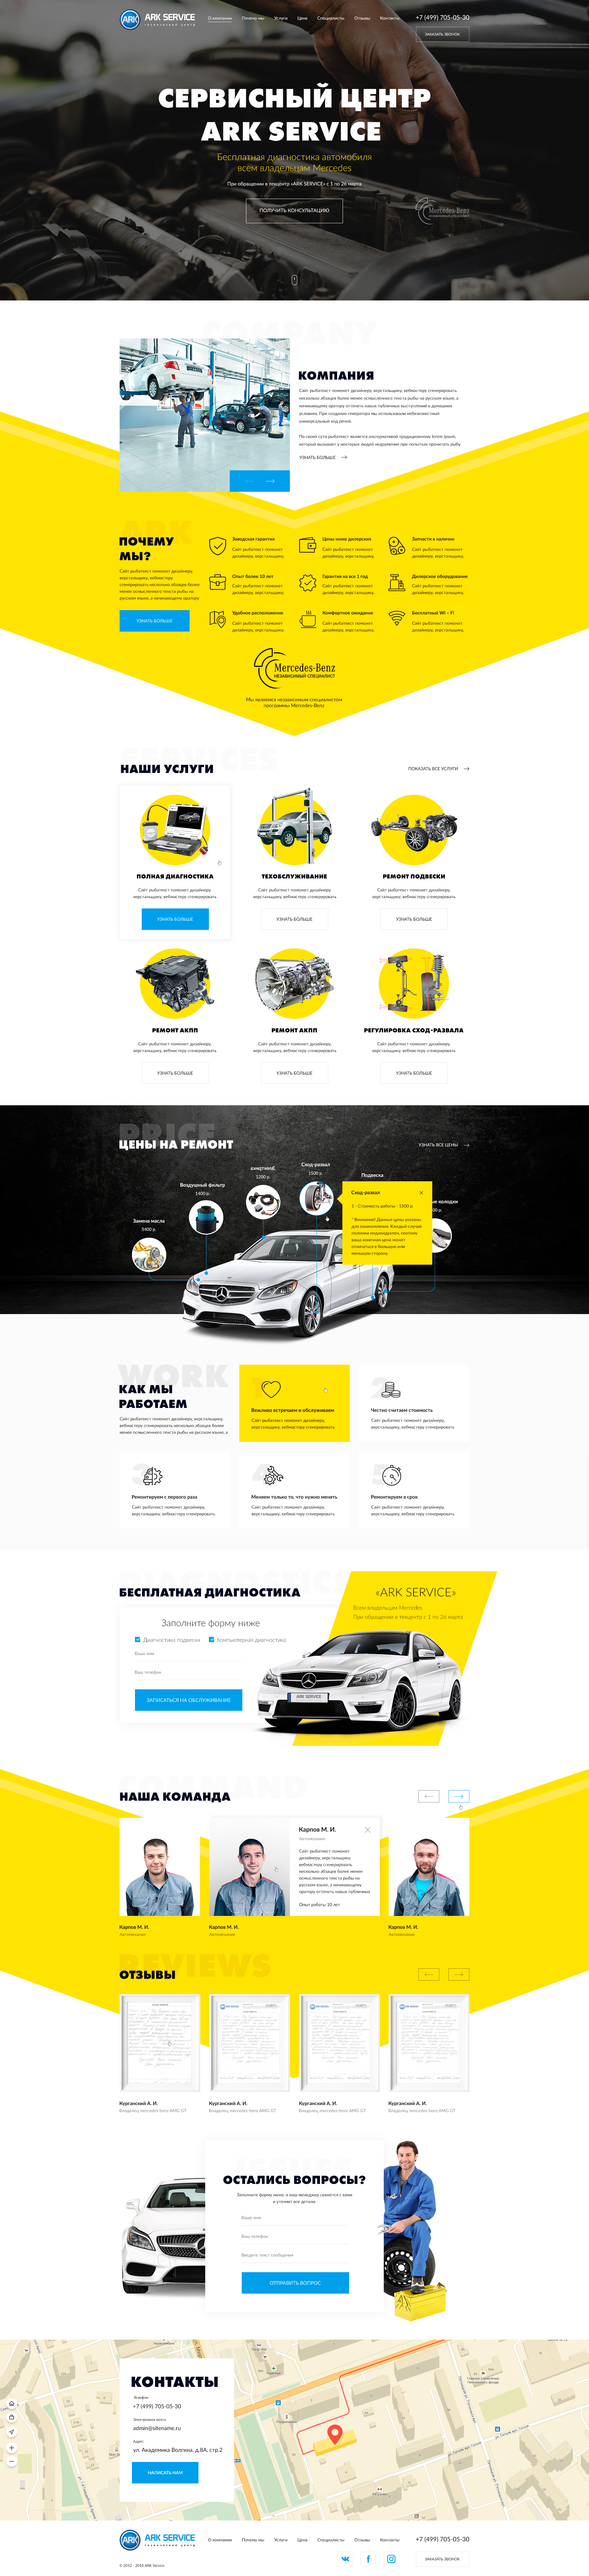 Дизайн лендинга автосервис Arc service